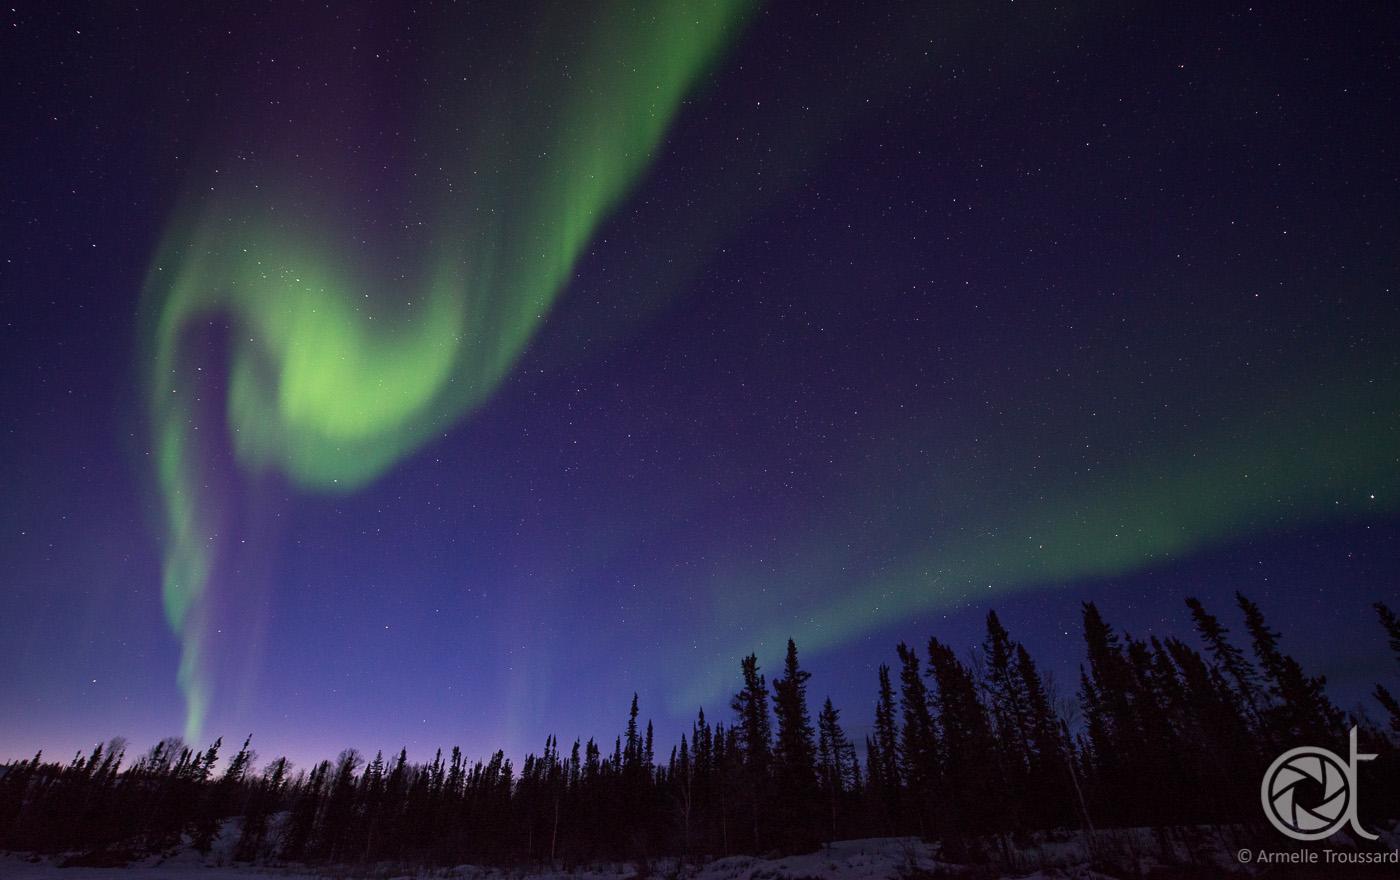 Northern lights - Walsh lake, Northwest Territories, Canada.